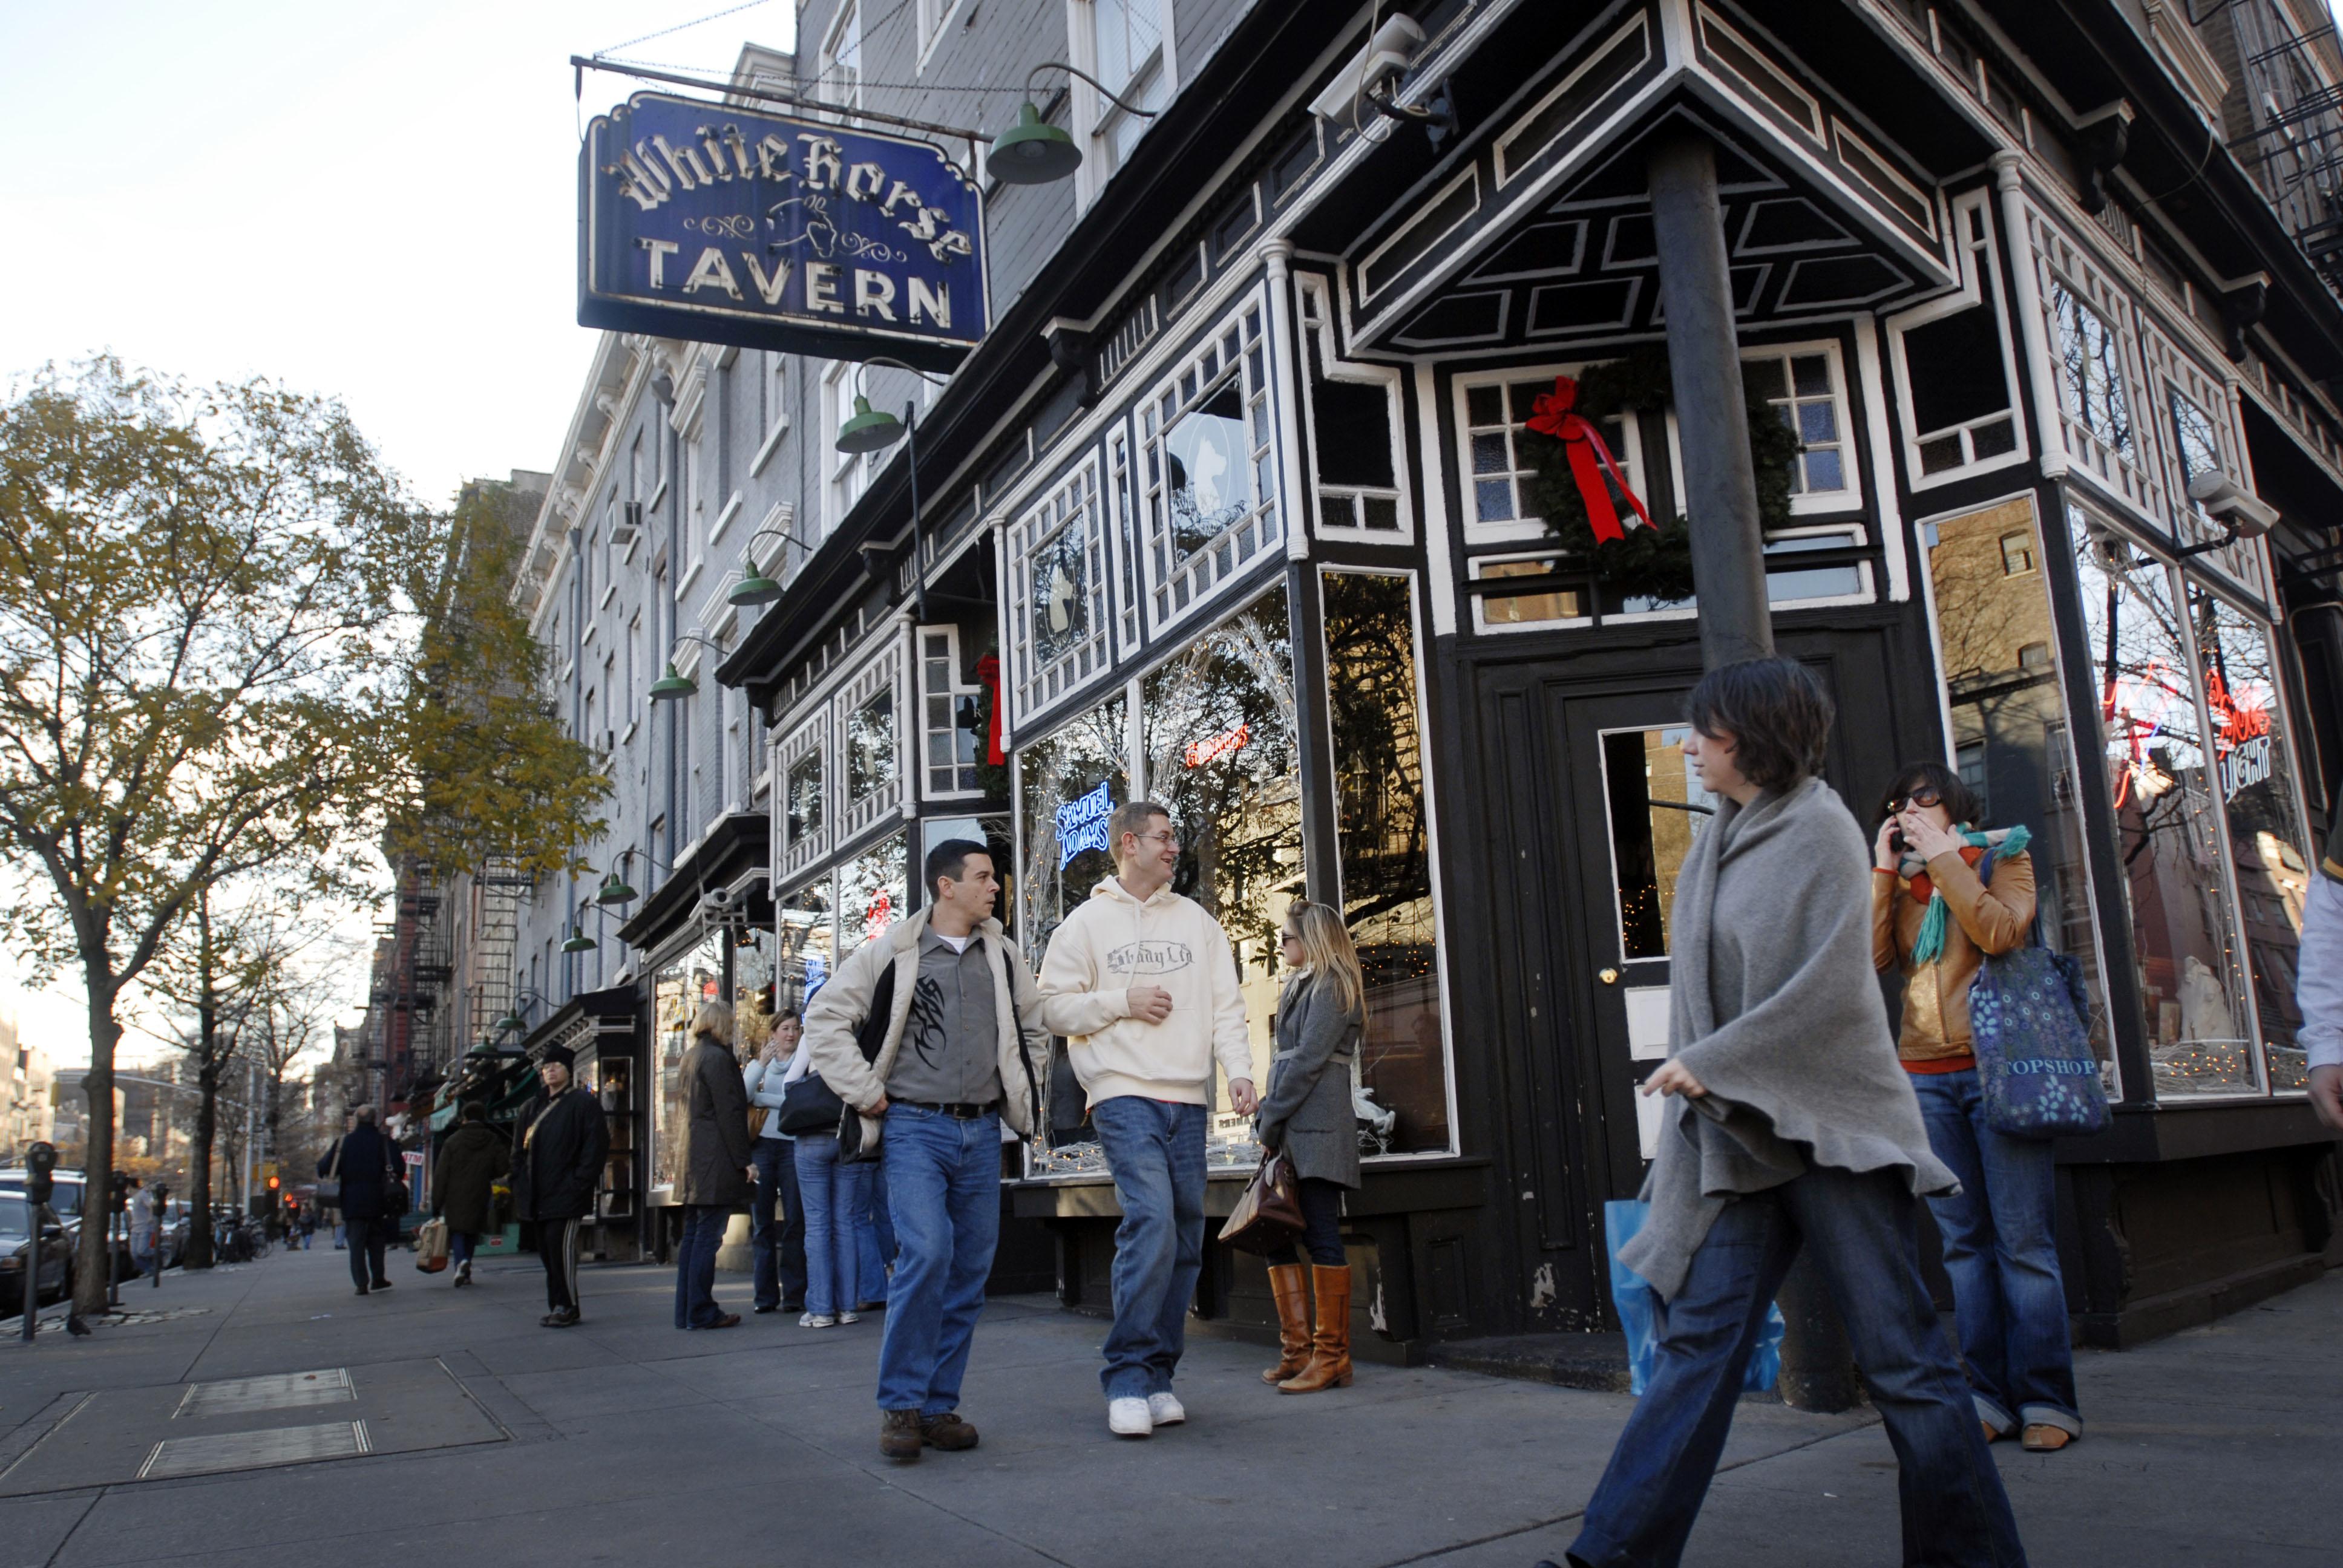 'We will not go gentle into that good night': Pols push to landmark White Horse Tavern interiors